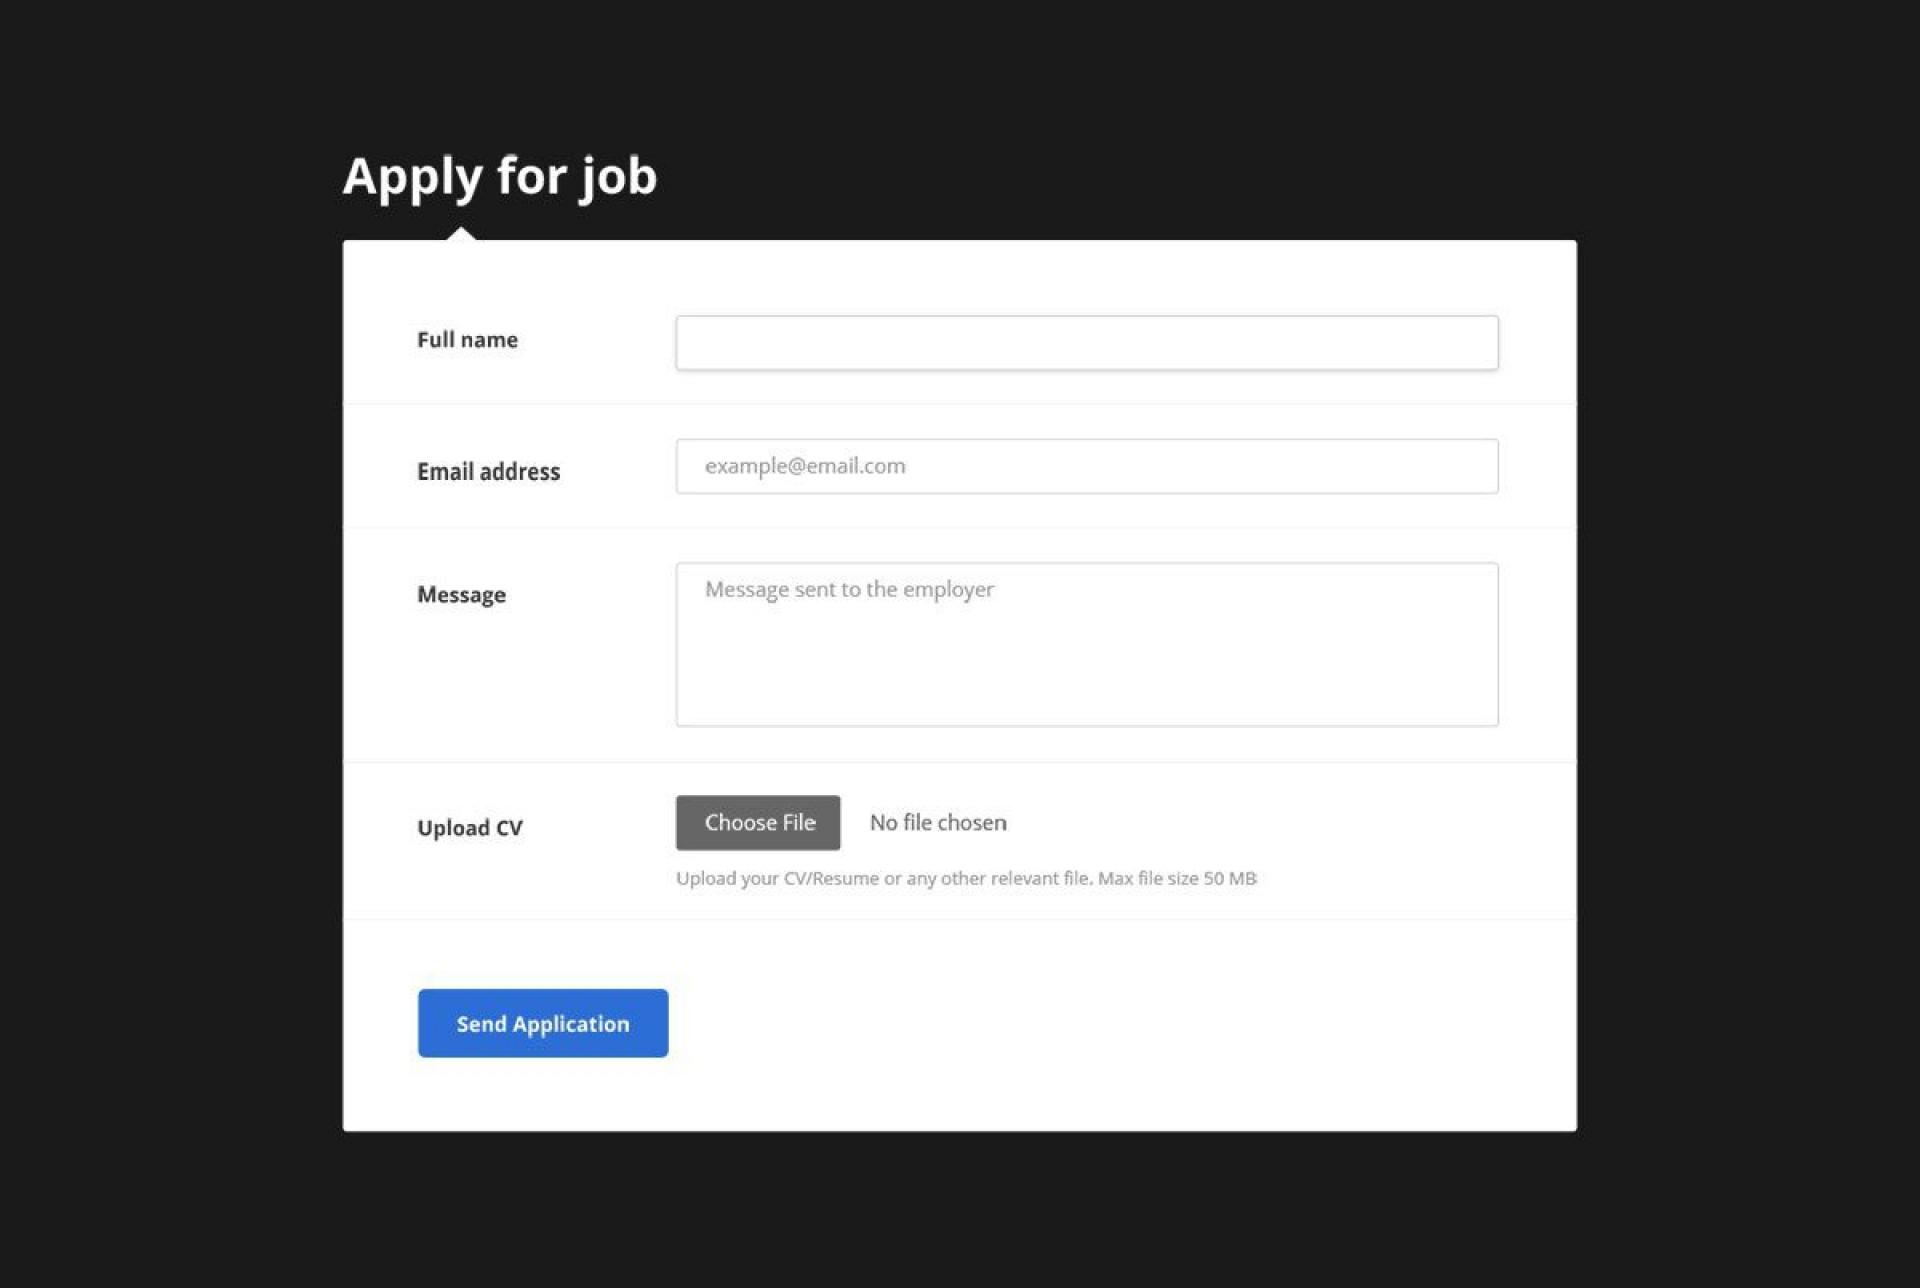 006 Breathtaking New User Setup Form Template Idea  Customer Word Account Vendor Excel1920